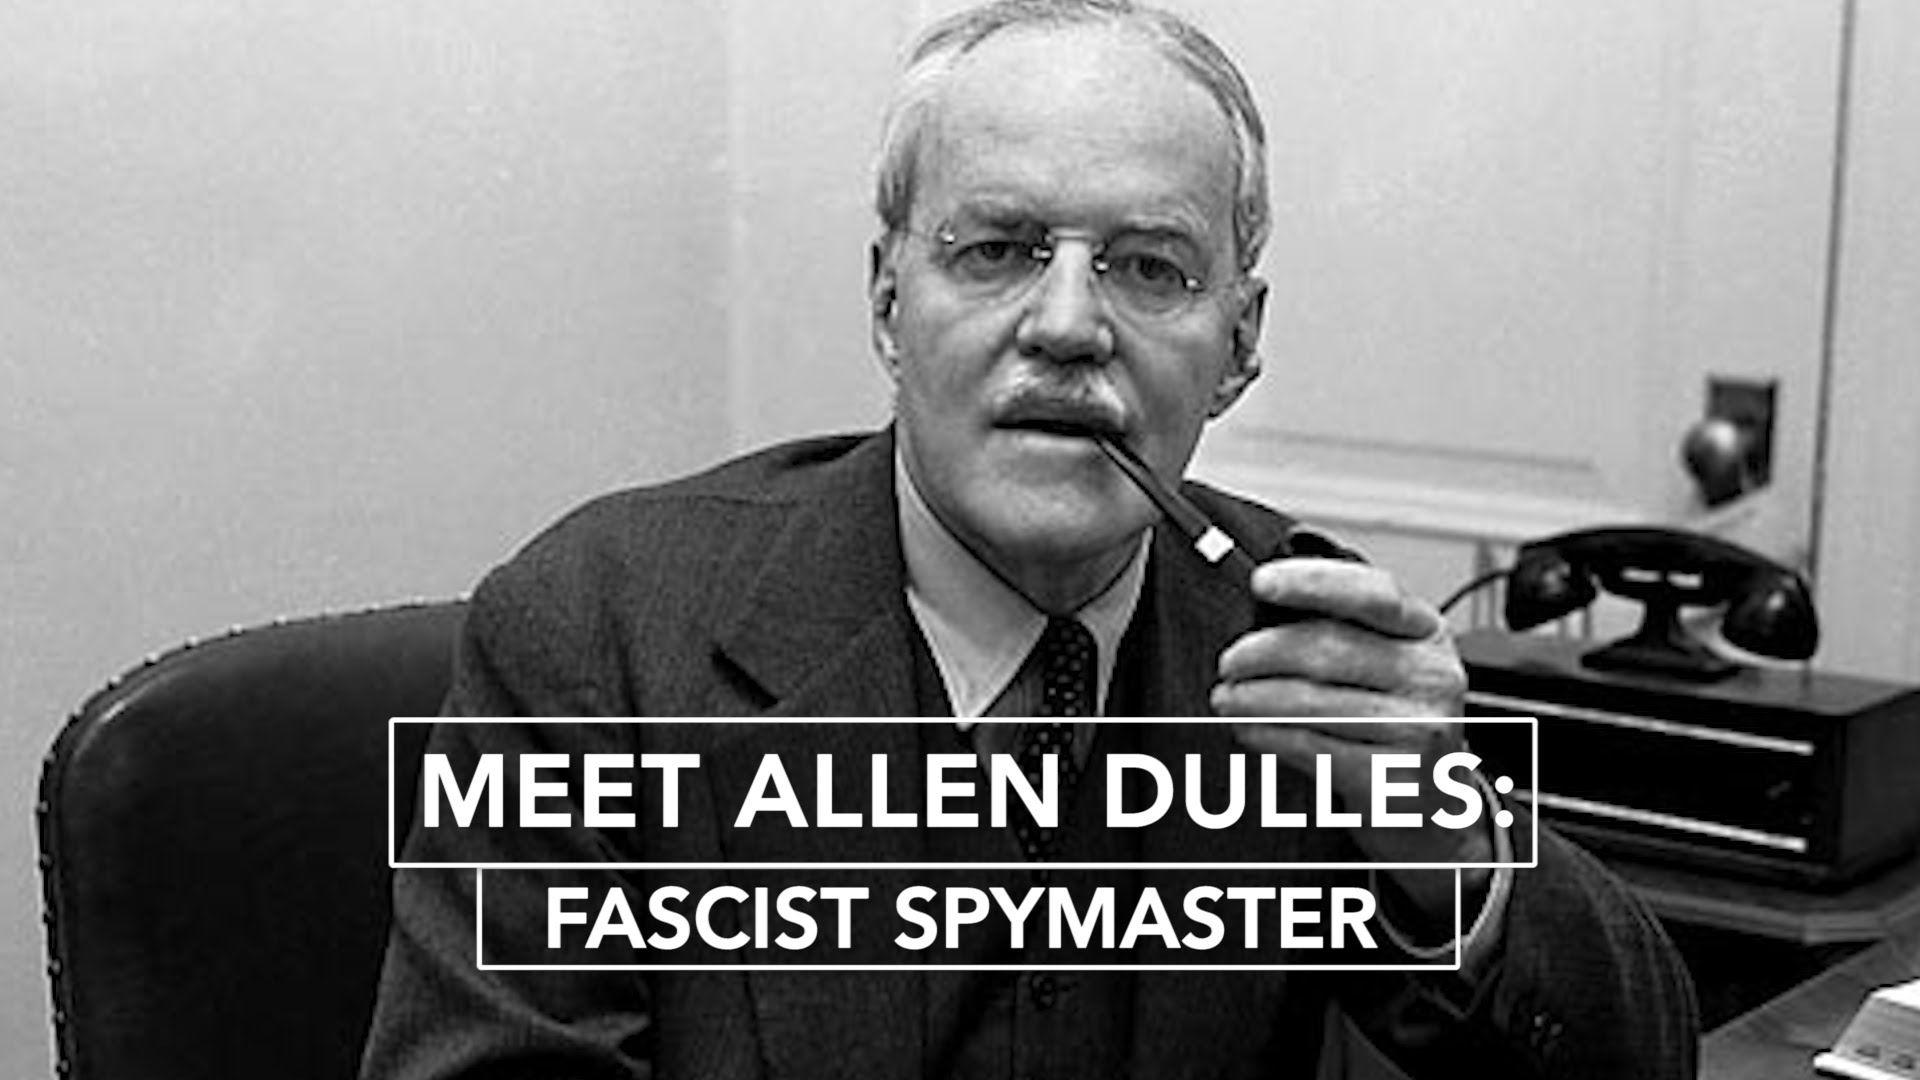 Meet Allen Dulles: Fascist Spymaster